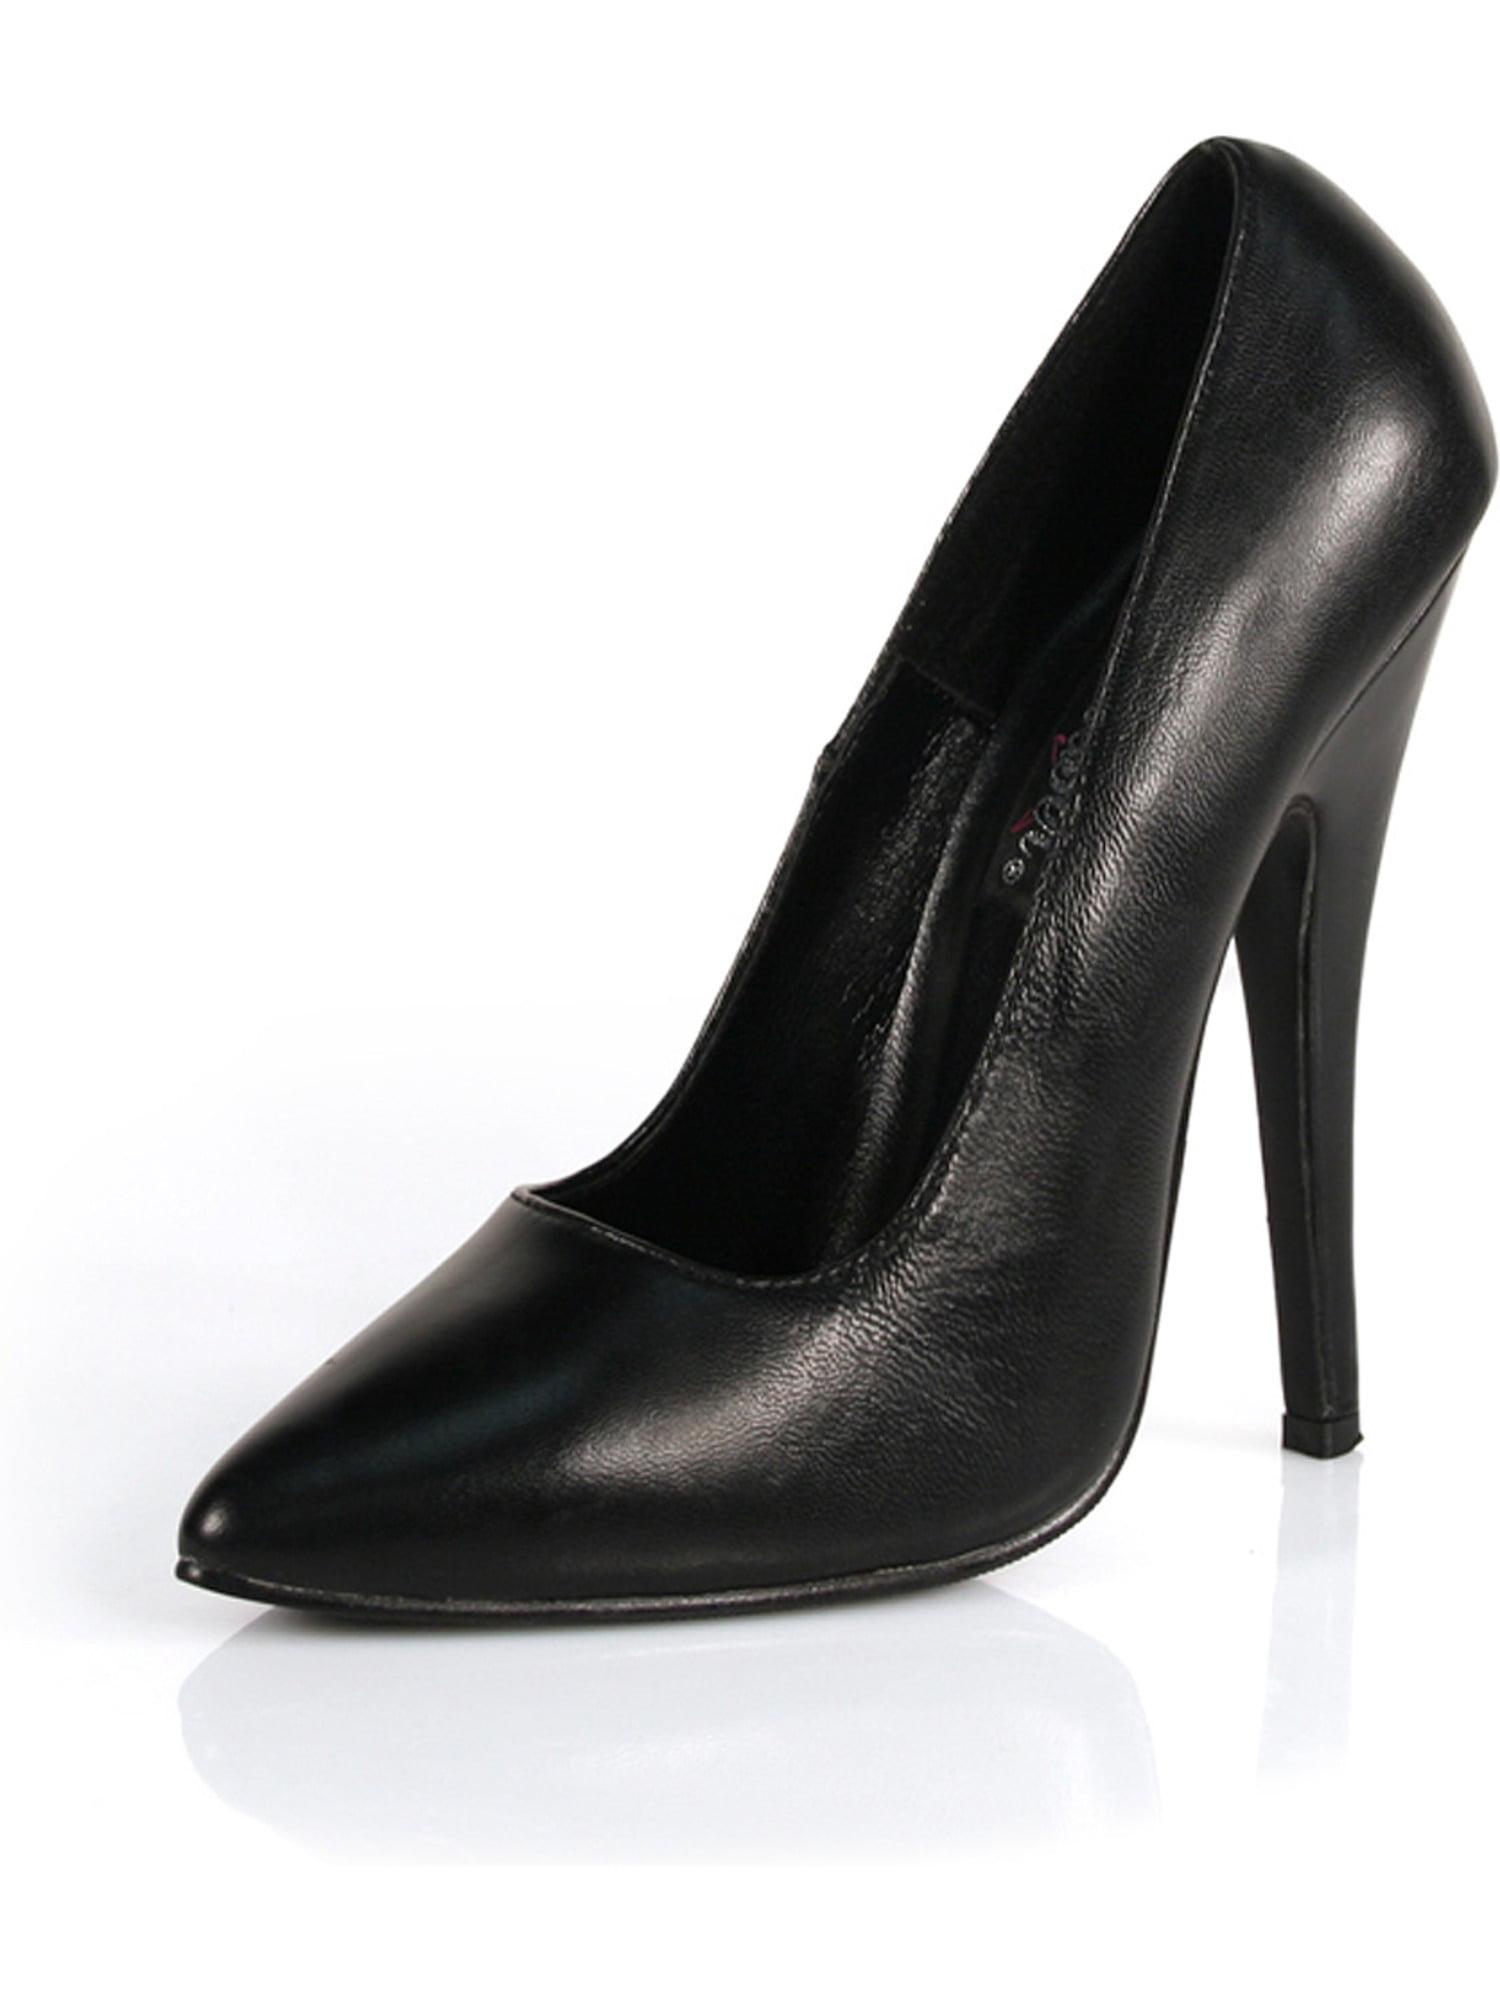 6 Inch Sexy High Heel Shoe Classic Pump Black Leather